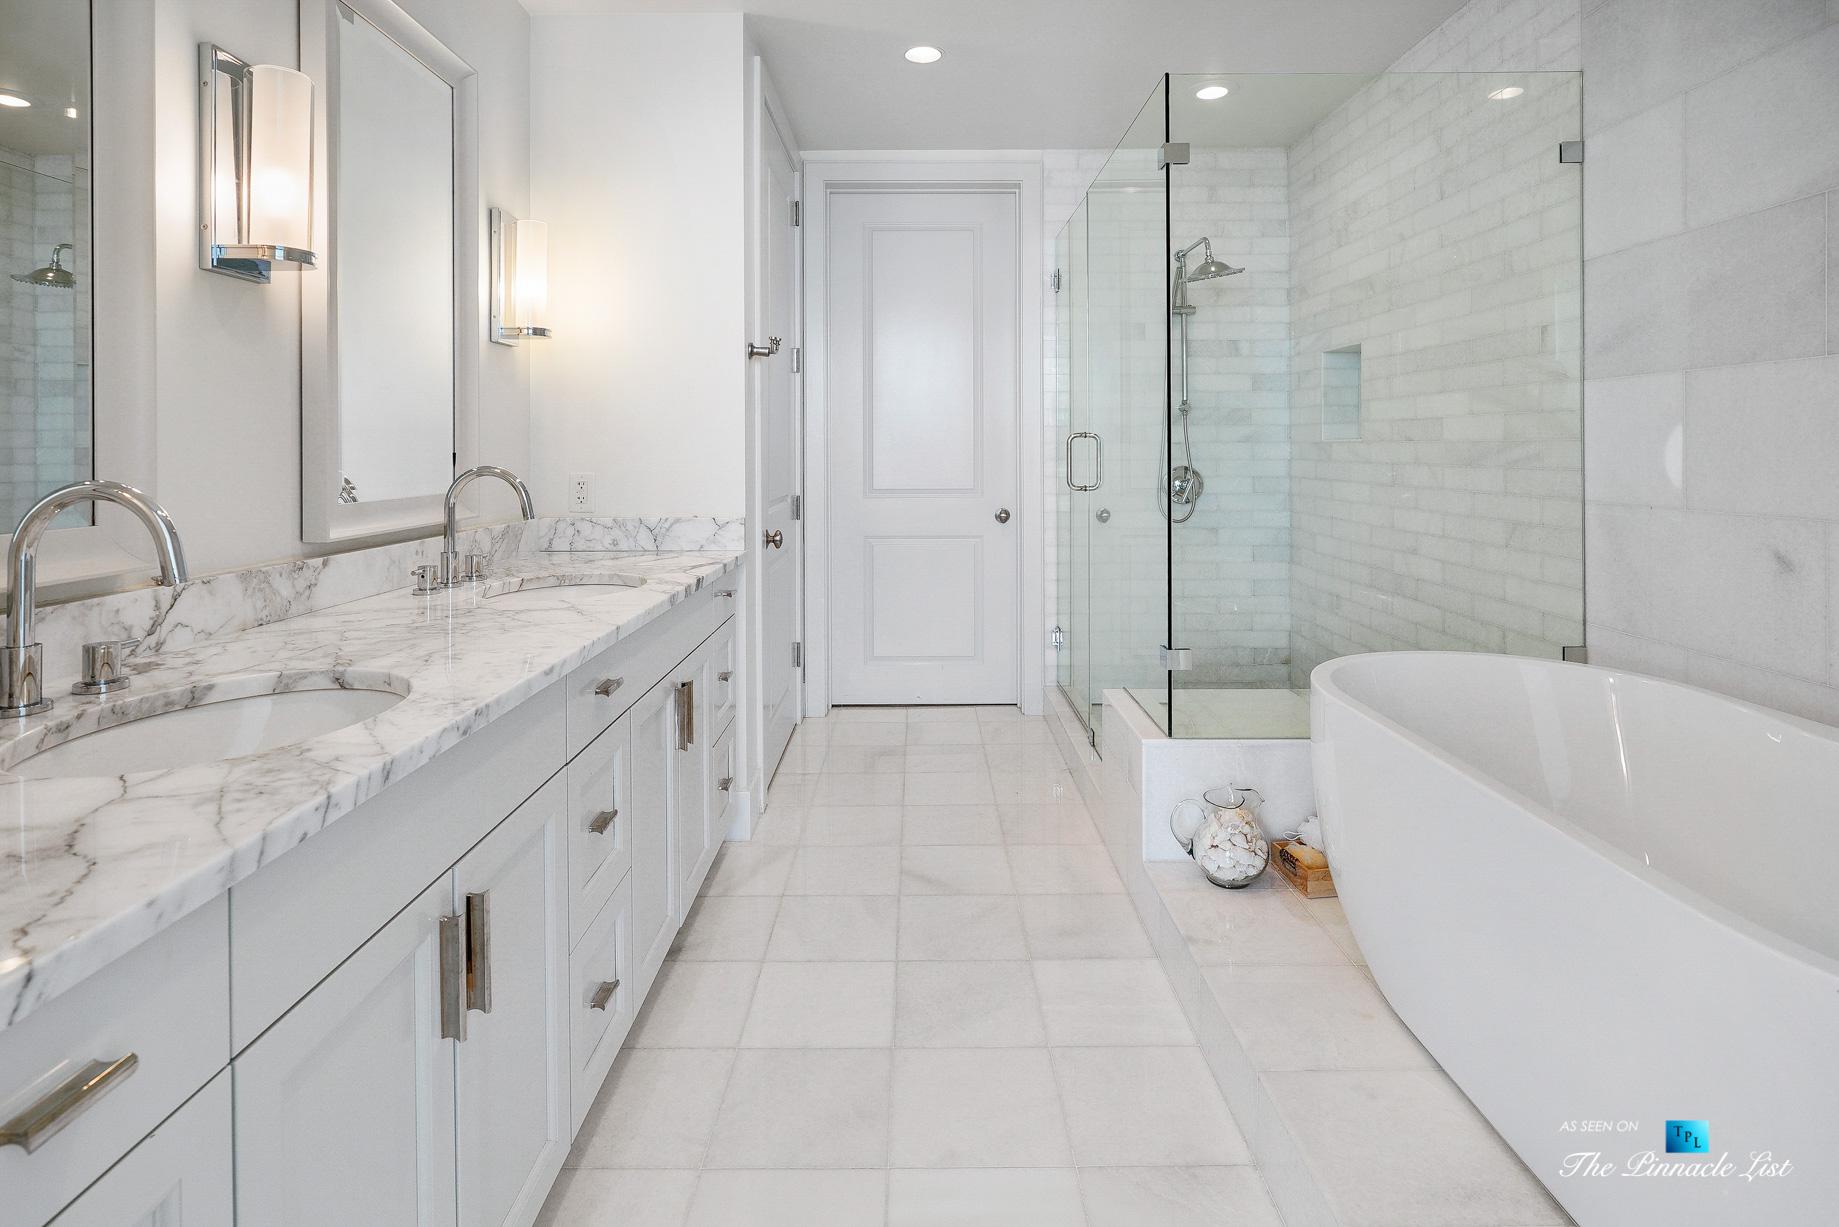 3630 Peachtree Rd NE, Unit 2307, Atlanta, GA, USA – Apartment Master Bathroom – Luxury Real Estate – Ritz-Carlton Residences Buckhead